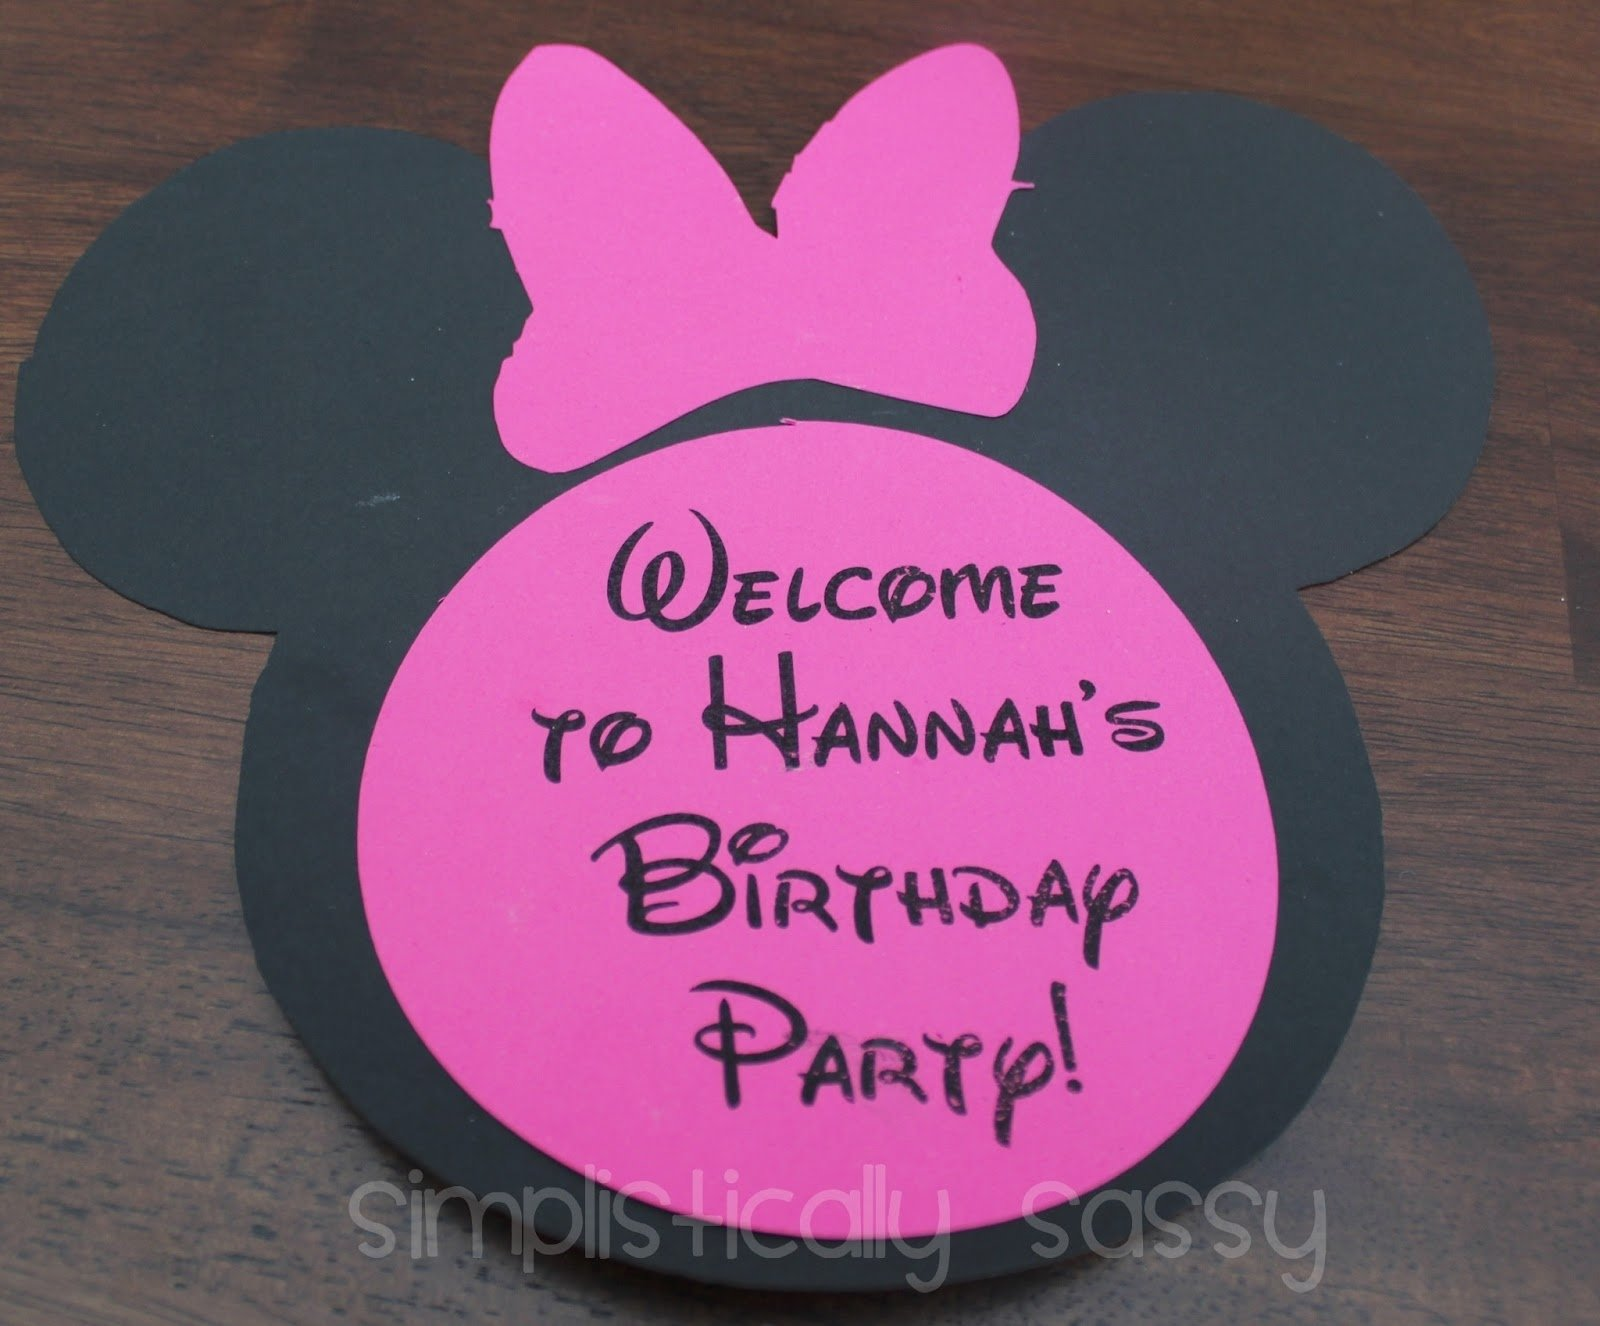 10 Elegant Minnie Mouse Birthday Party Ideas For A 2 Year Old mini minnie mouse birthday party on a budgetsimplistically sassy 2021